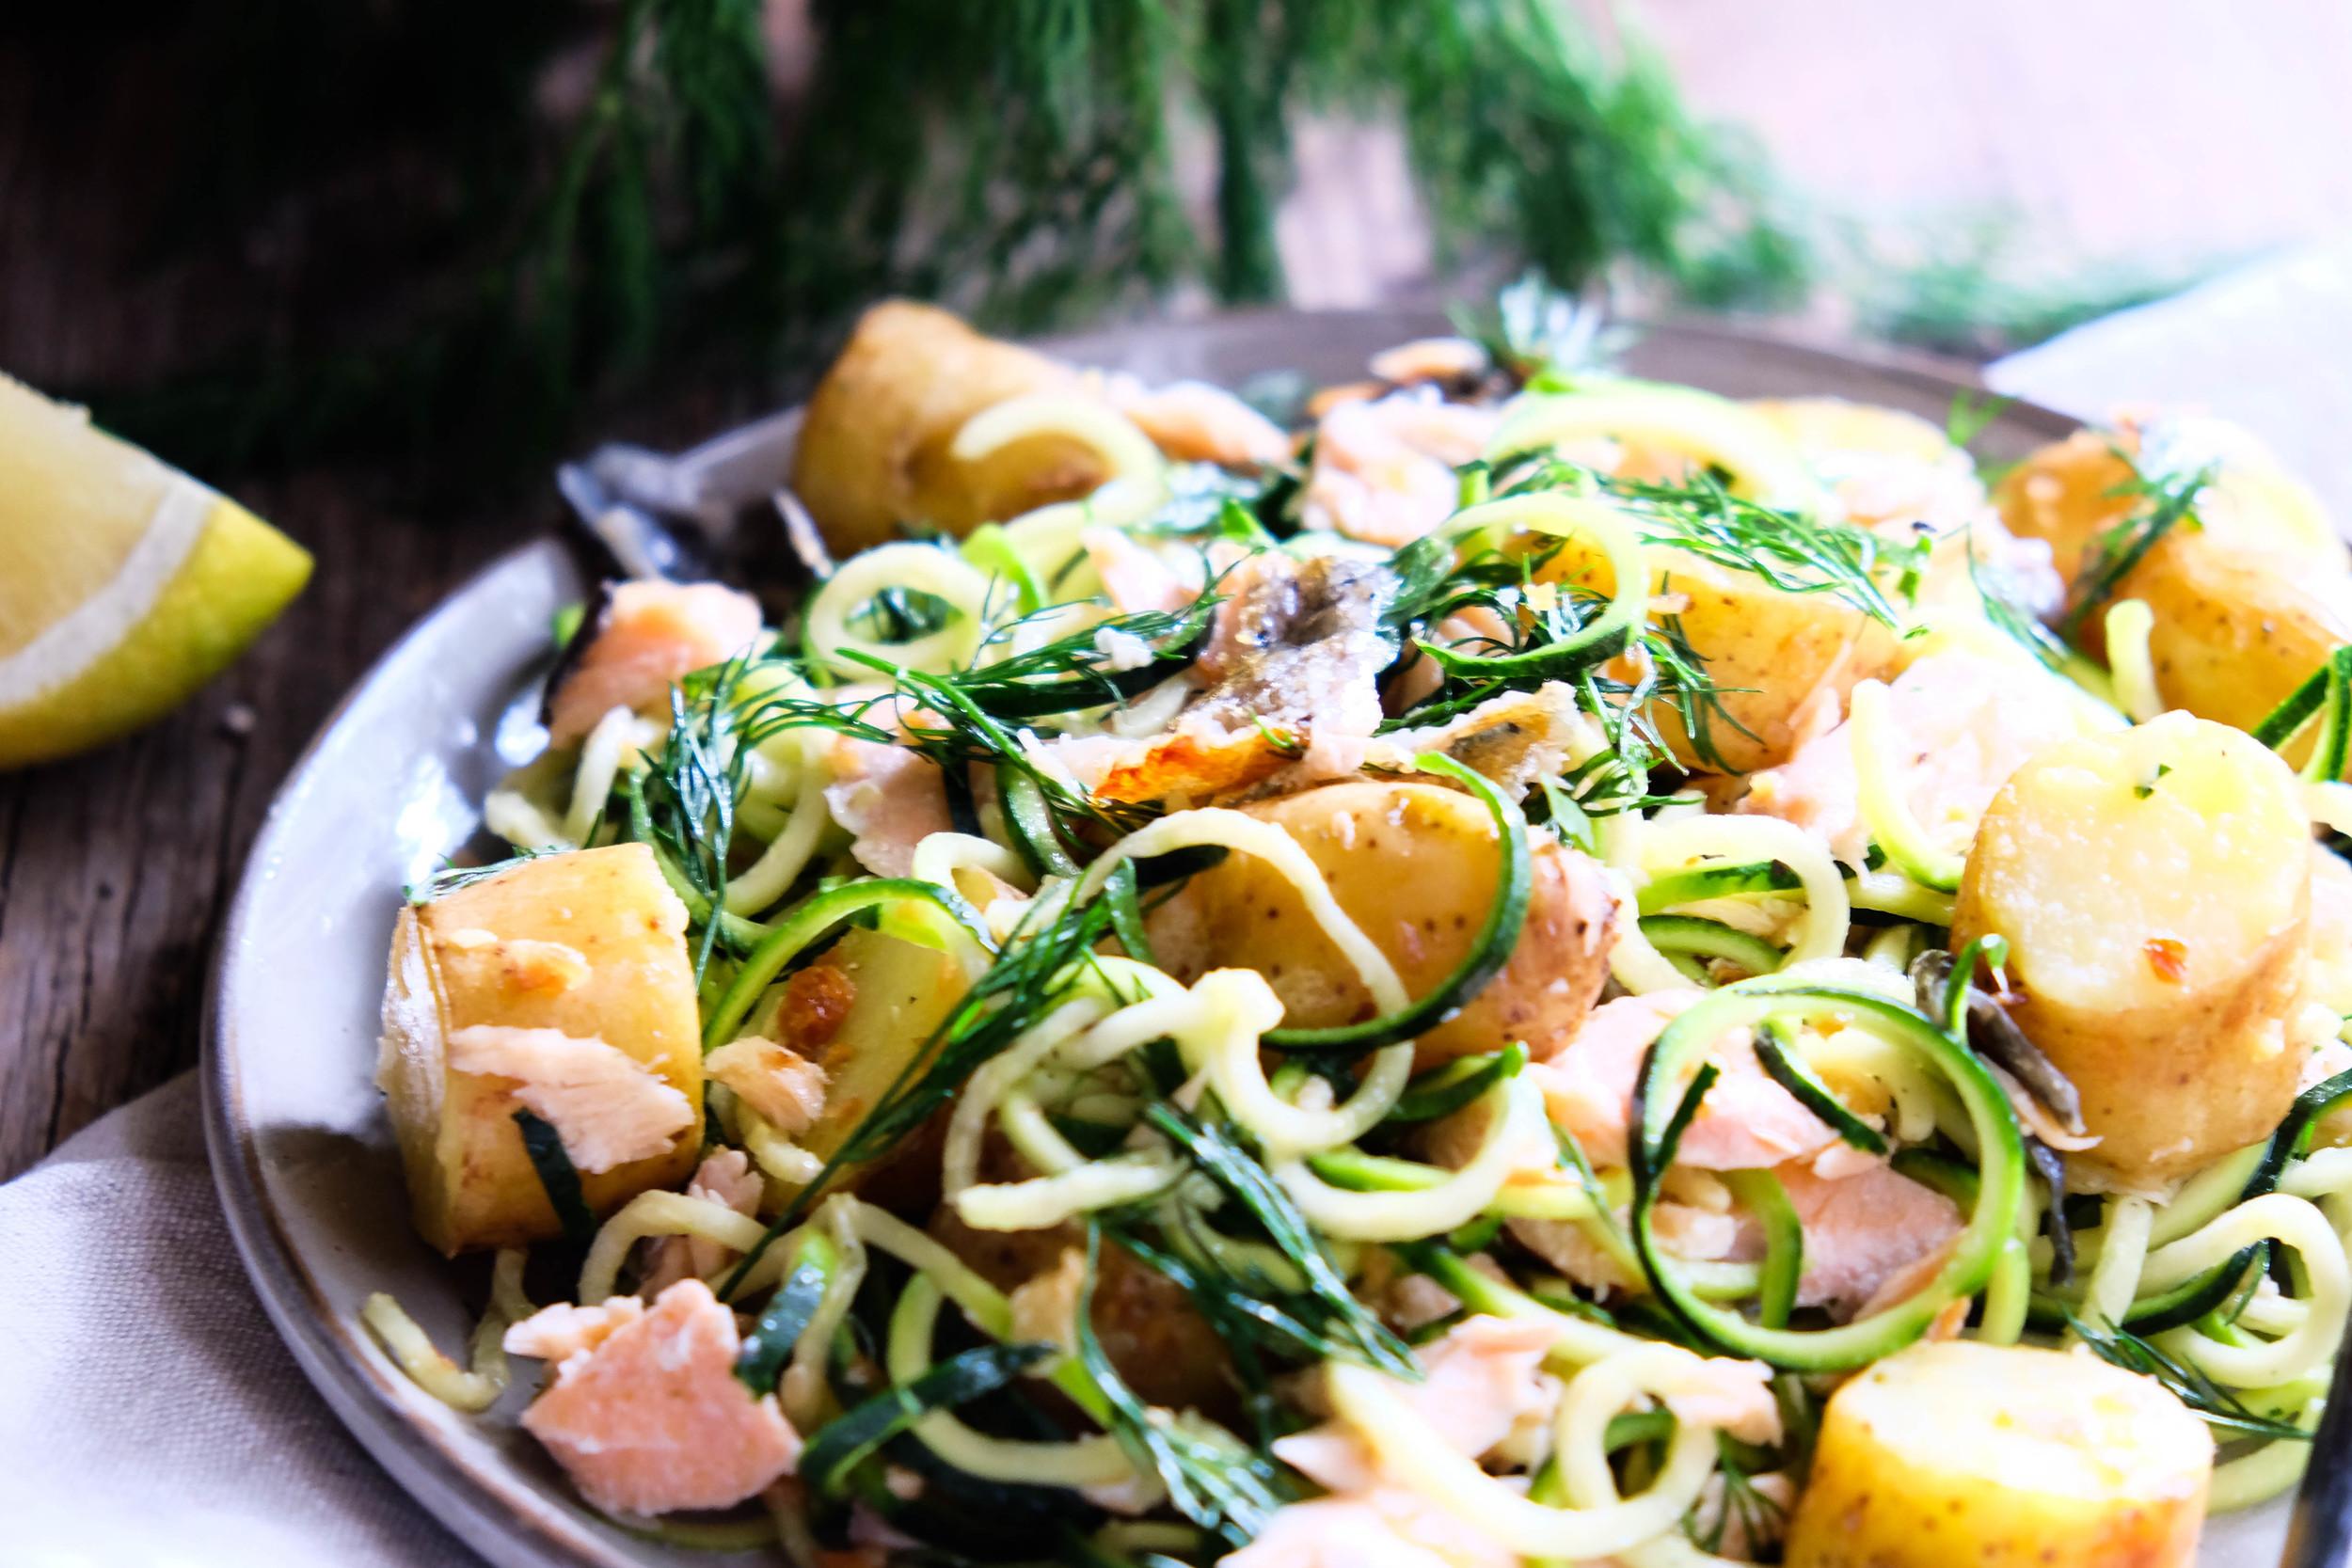 Warm salmon and potato salad